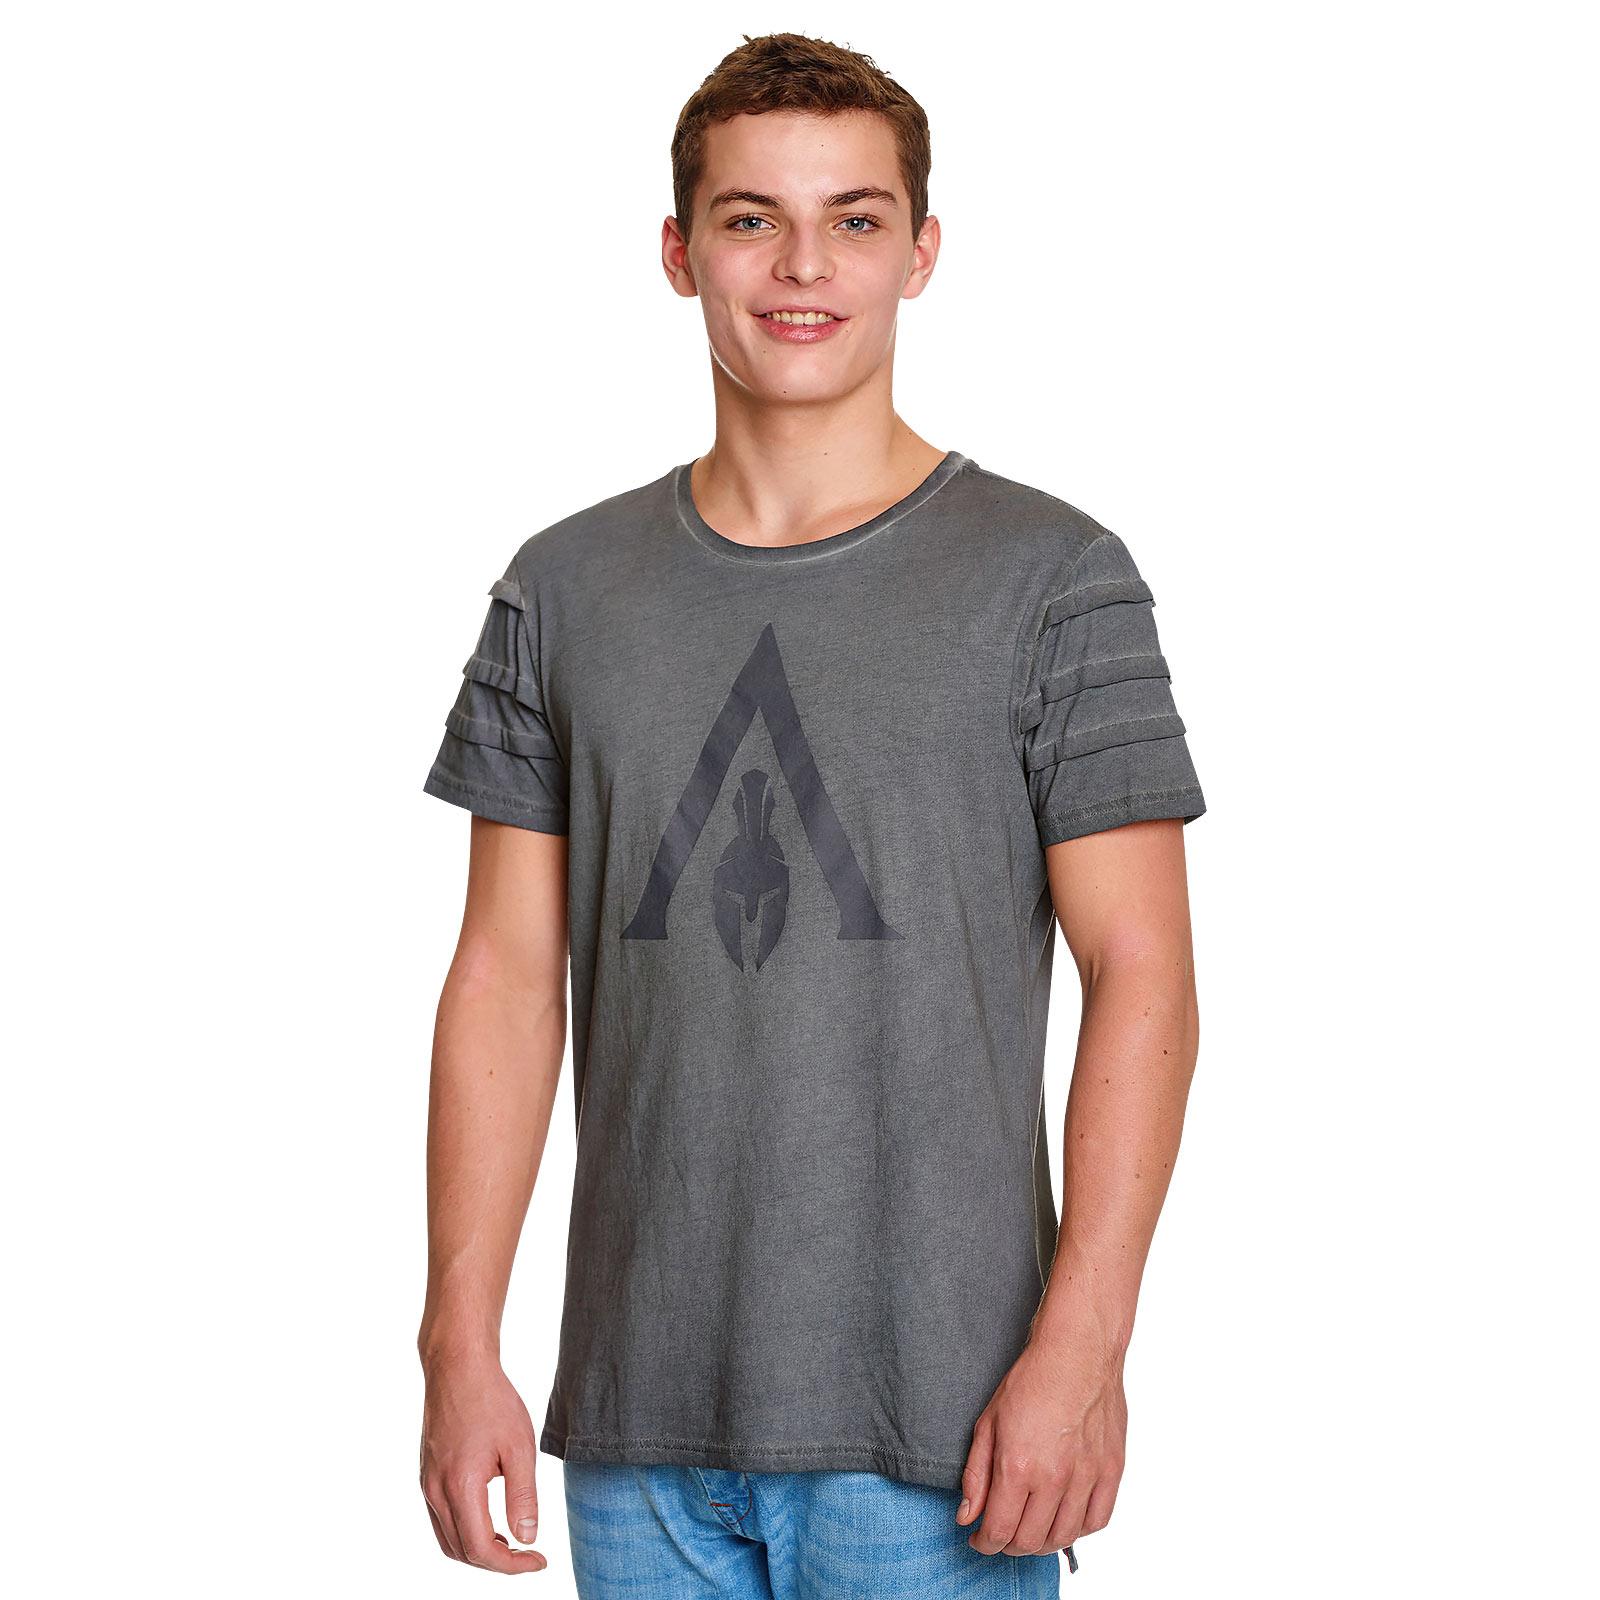 Assassins Creed - Odyssey Logo T-Shirt grau